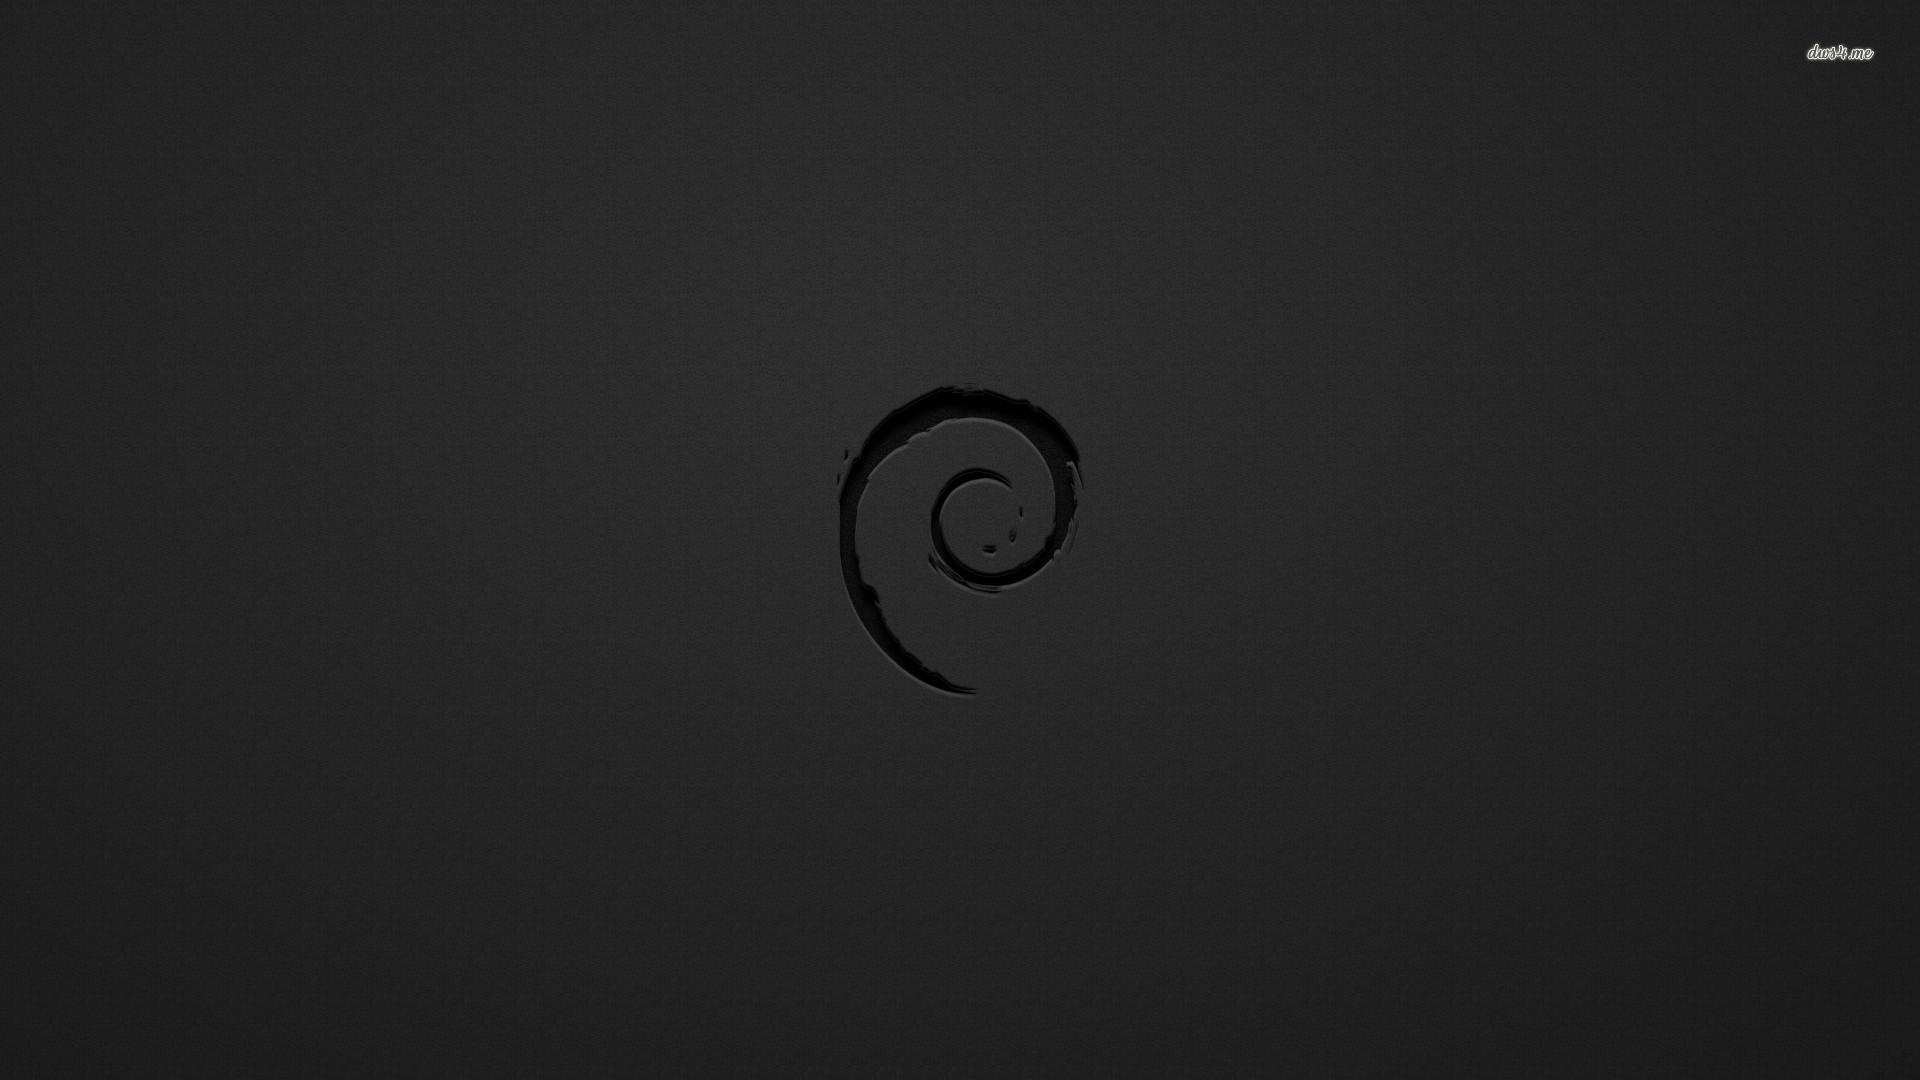 Res: 1920x1080, Debian wallpaper - Computer wallpapers - #